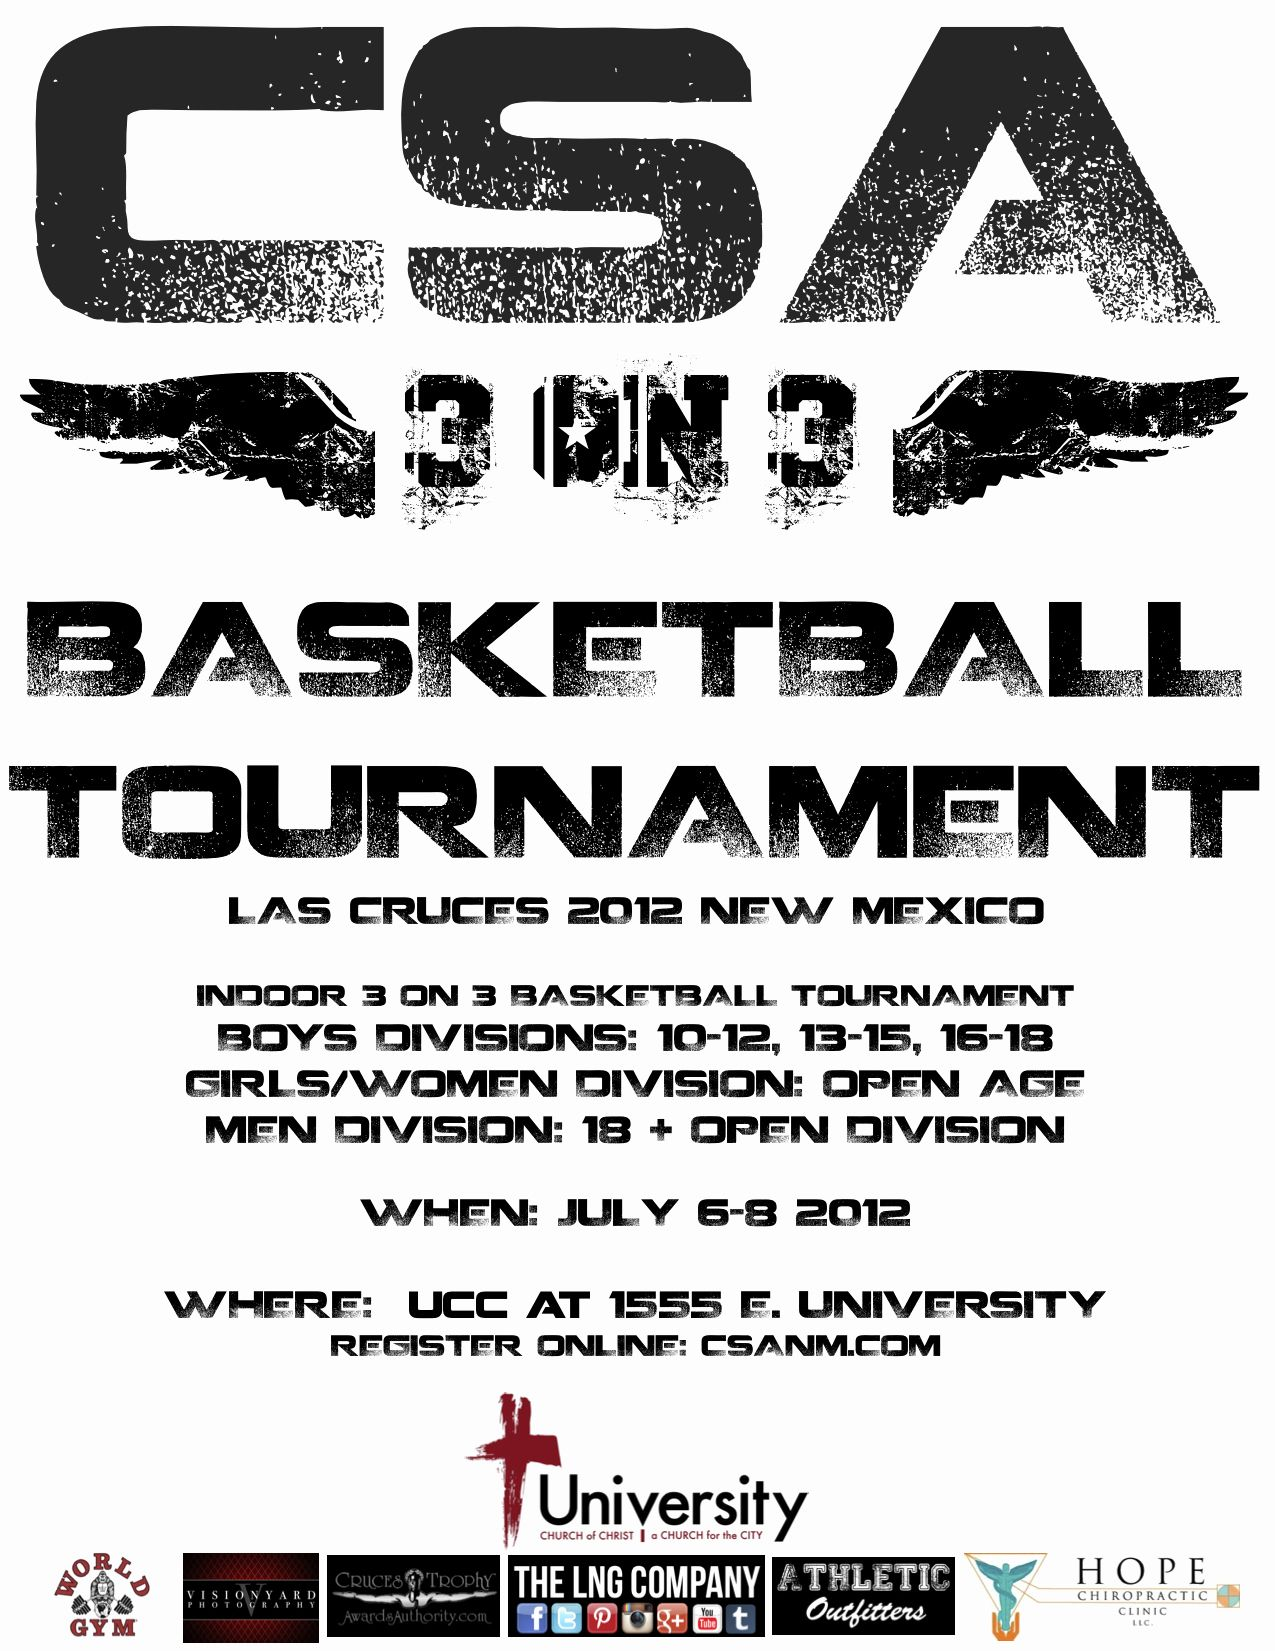 Basketball tournament Flyer Template Luxury 3 3 Basketball